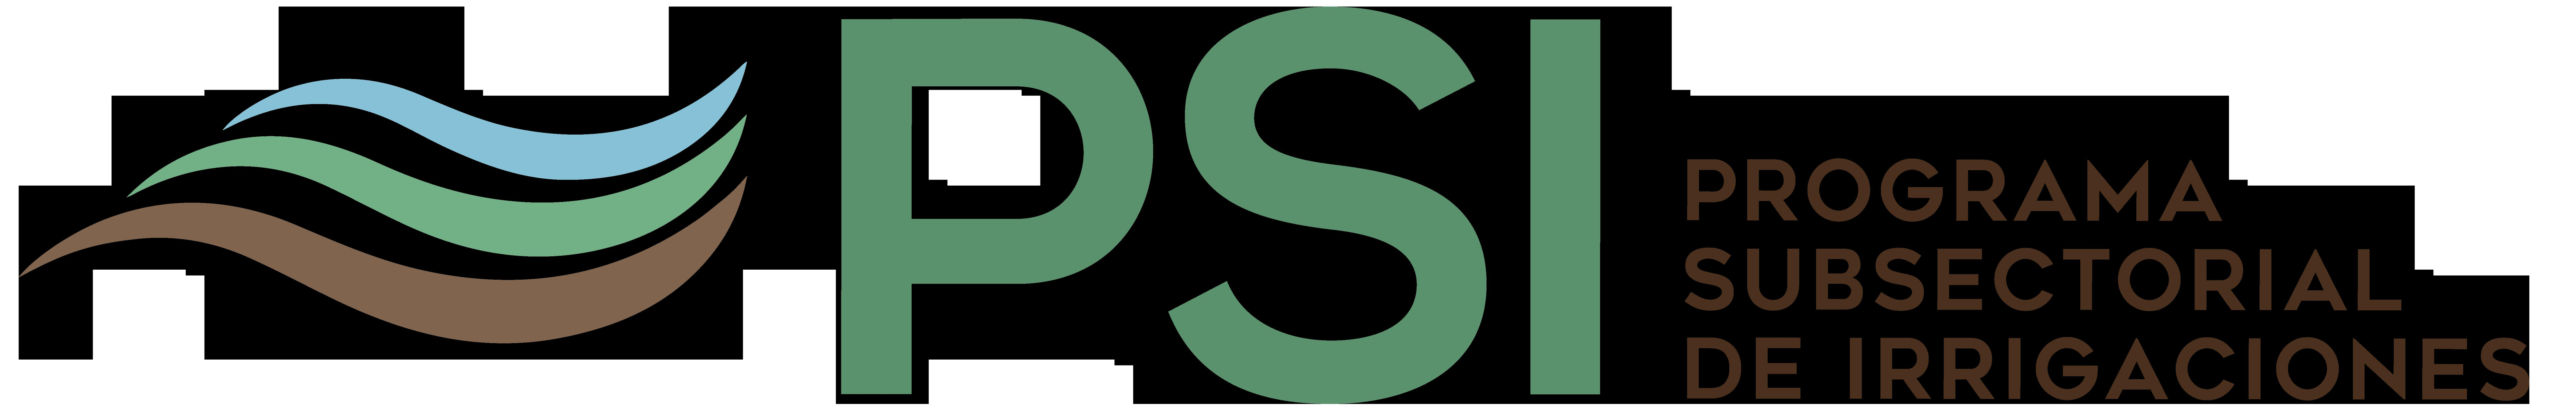 logo Minagri